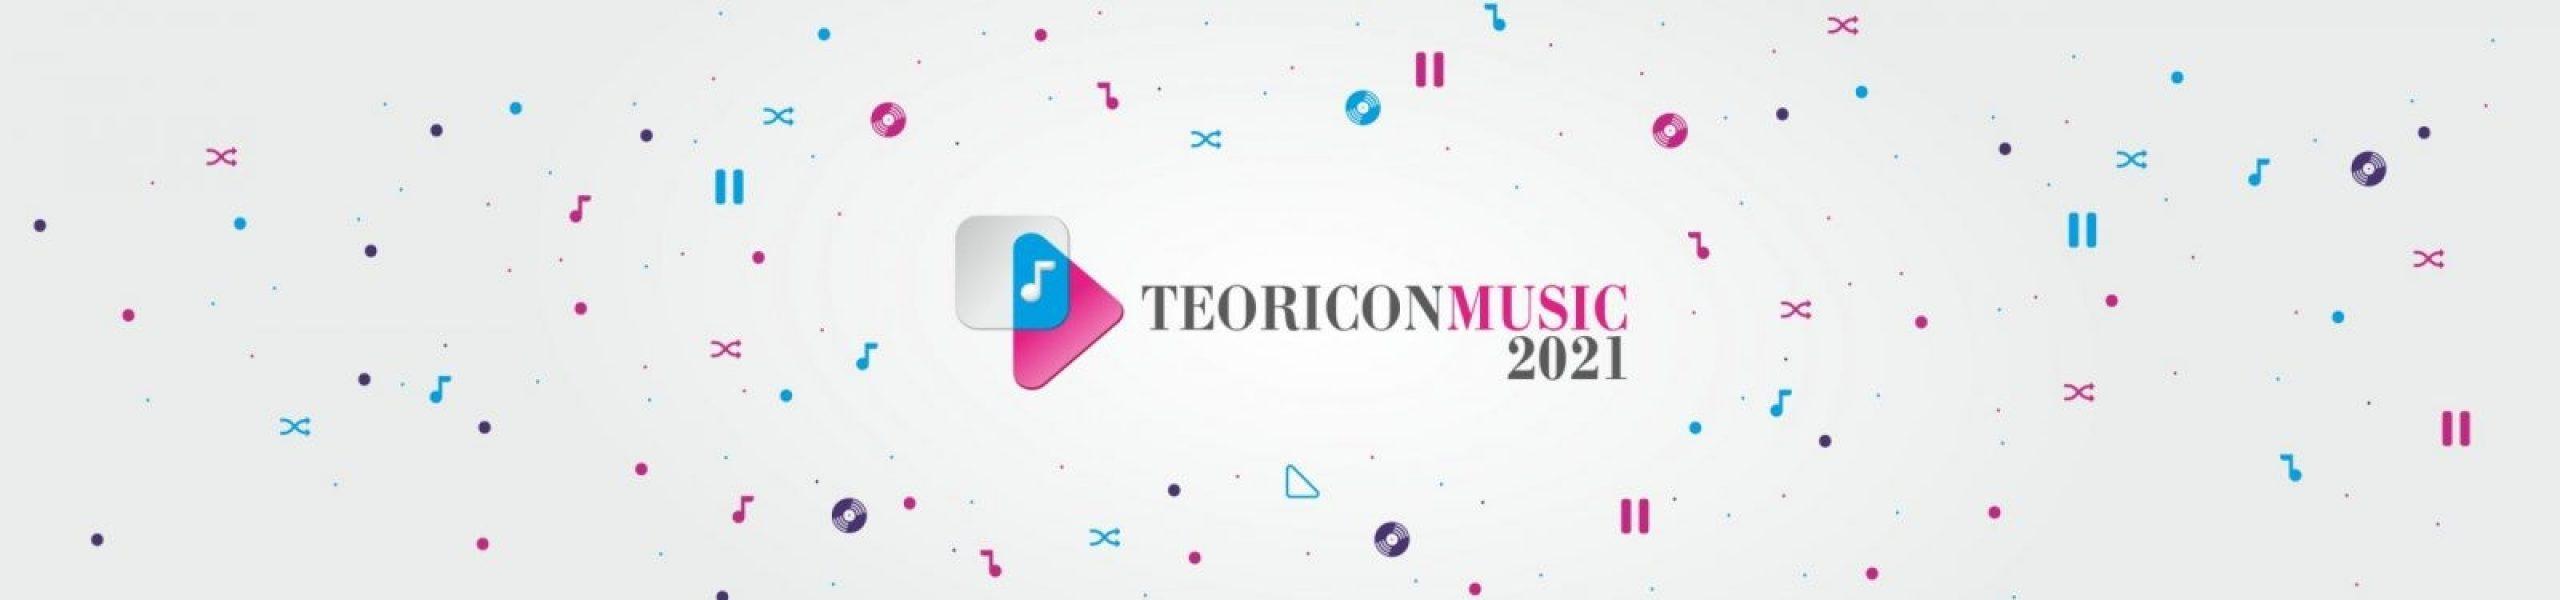 teoricon-music